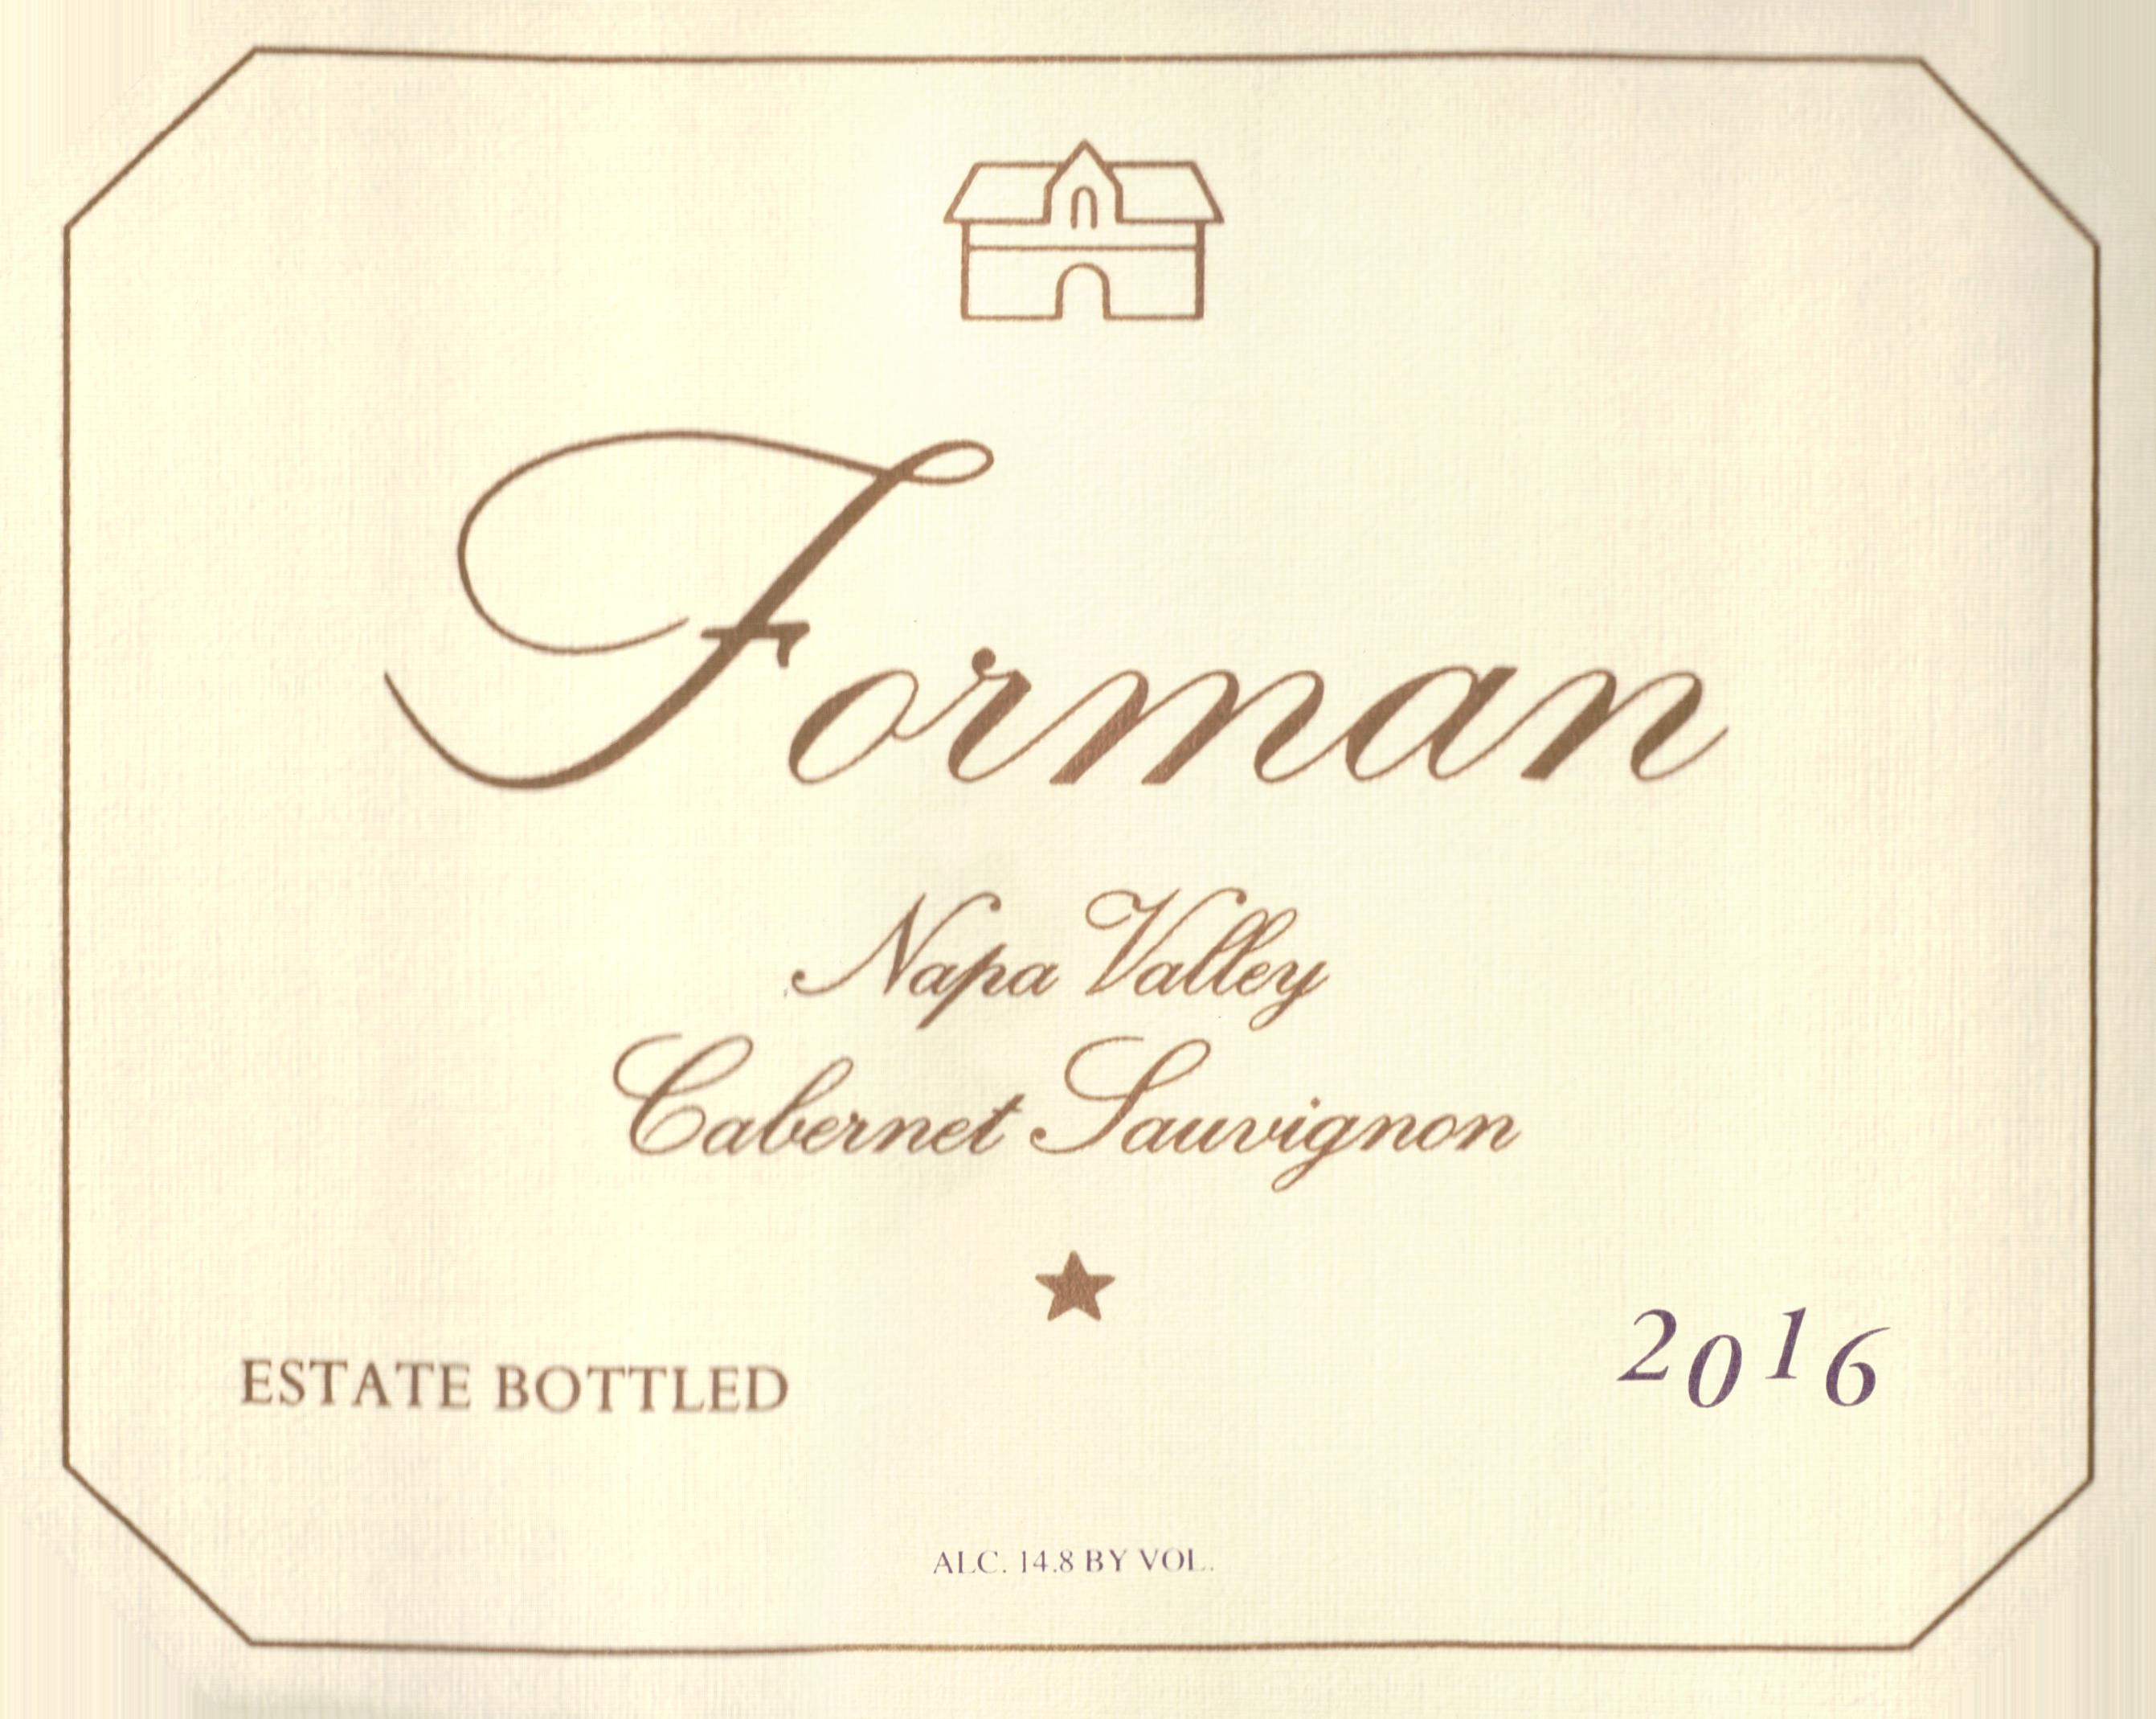 Forman Vineyard Cabernet Sauvignon Napa Valley 2016